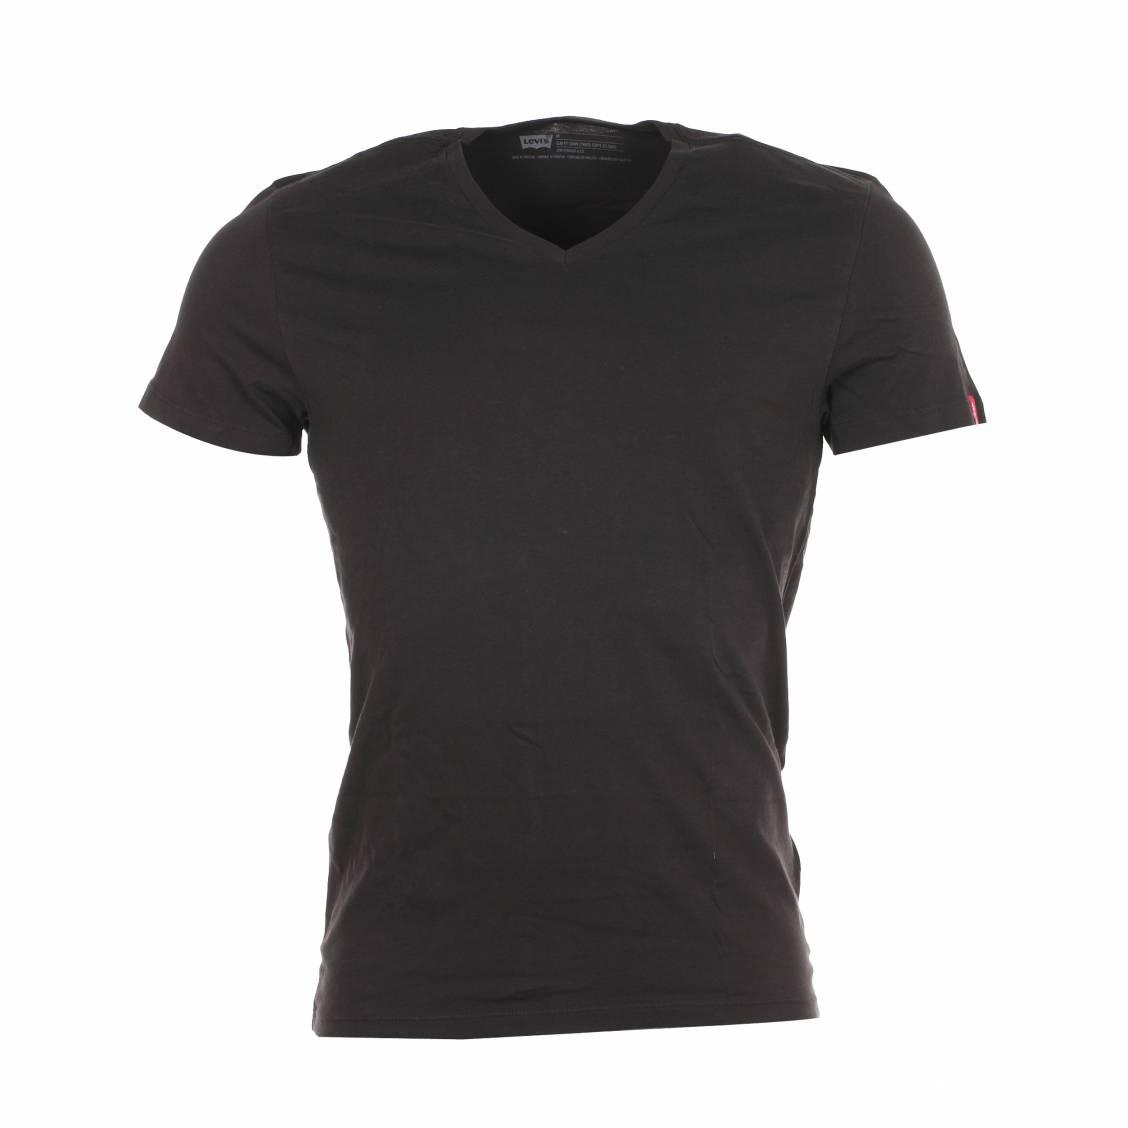 lot de 2 tee shirts noirs levis col v en coton rue des hommes. Black Bedroom Furniture Sets. Home Design Ideas